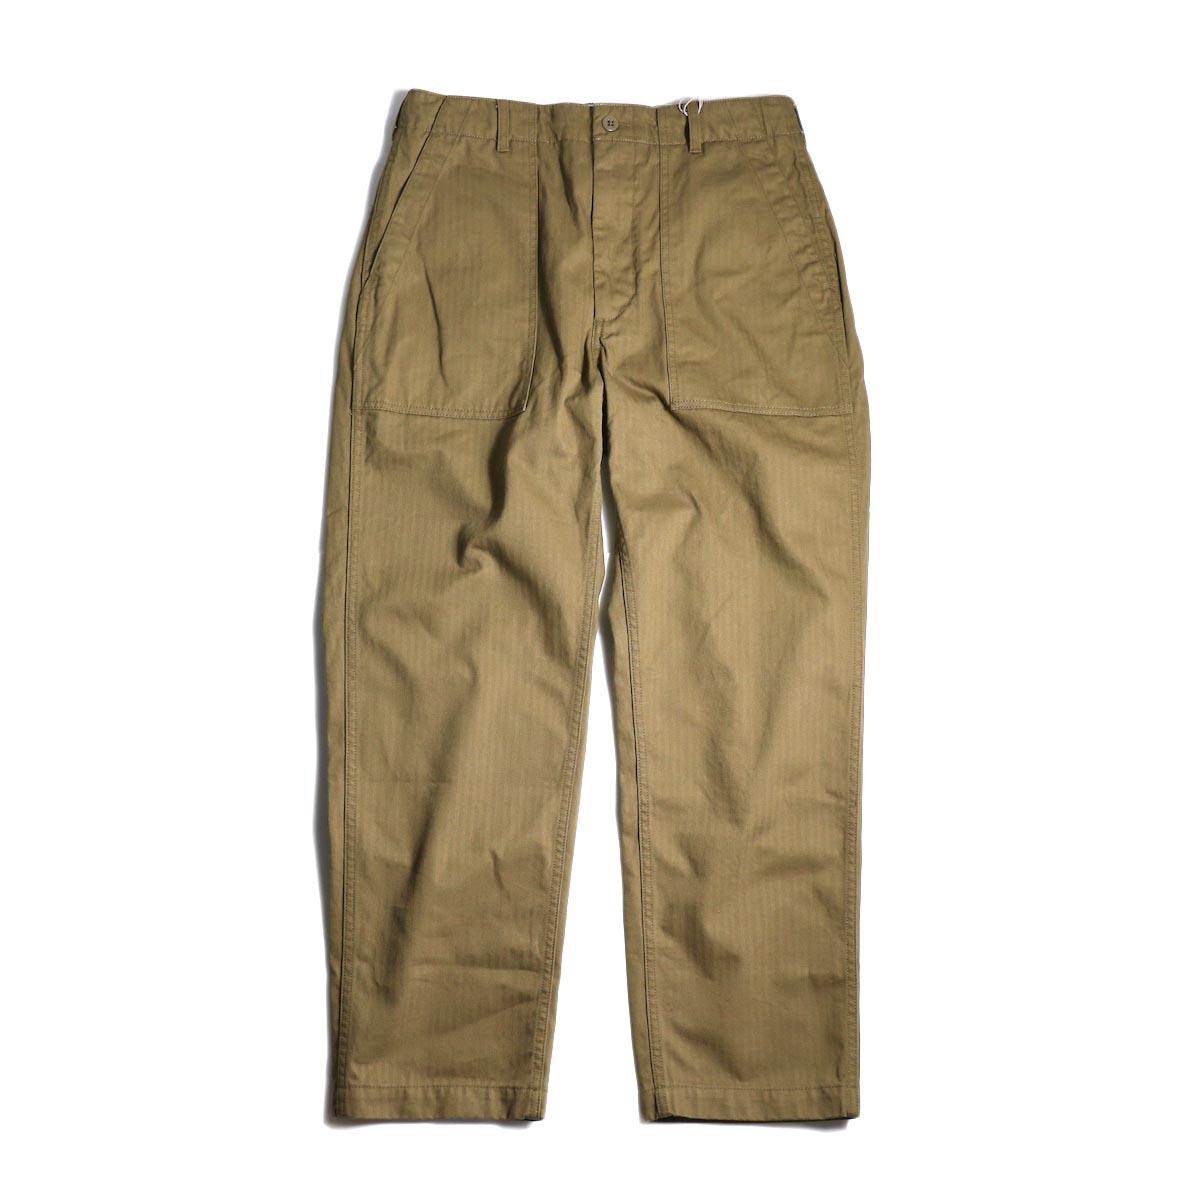 ENGINEERED GARMENTS / Fatigue Pant-HB Twill (Brown)全体